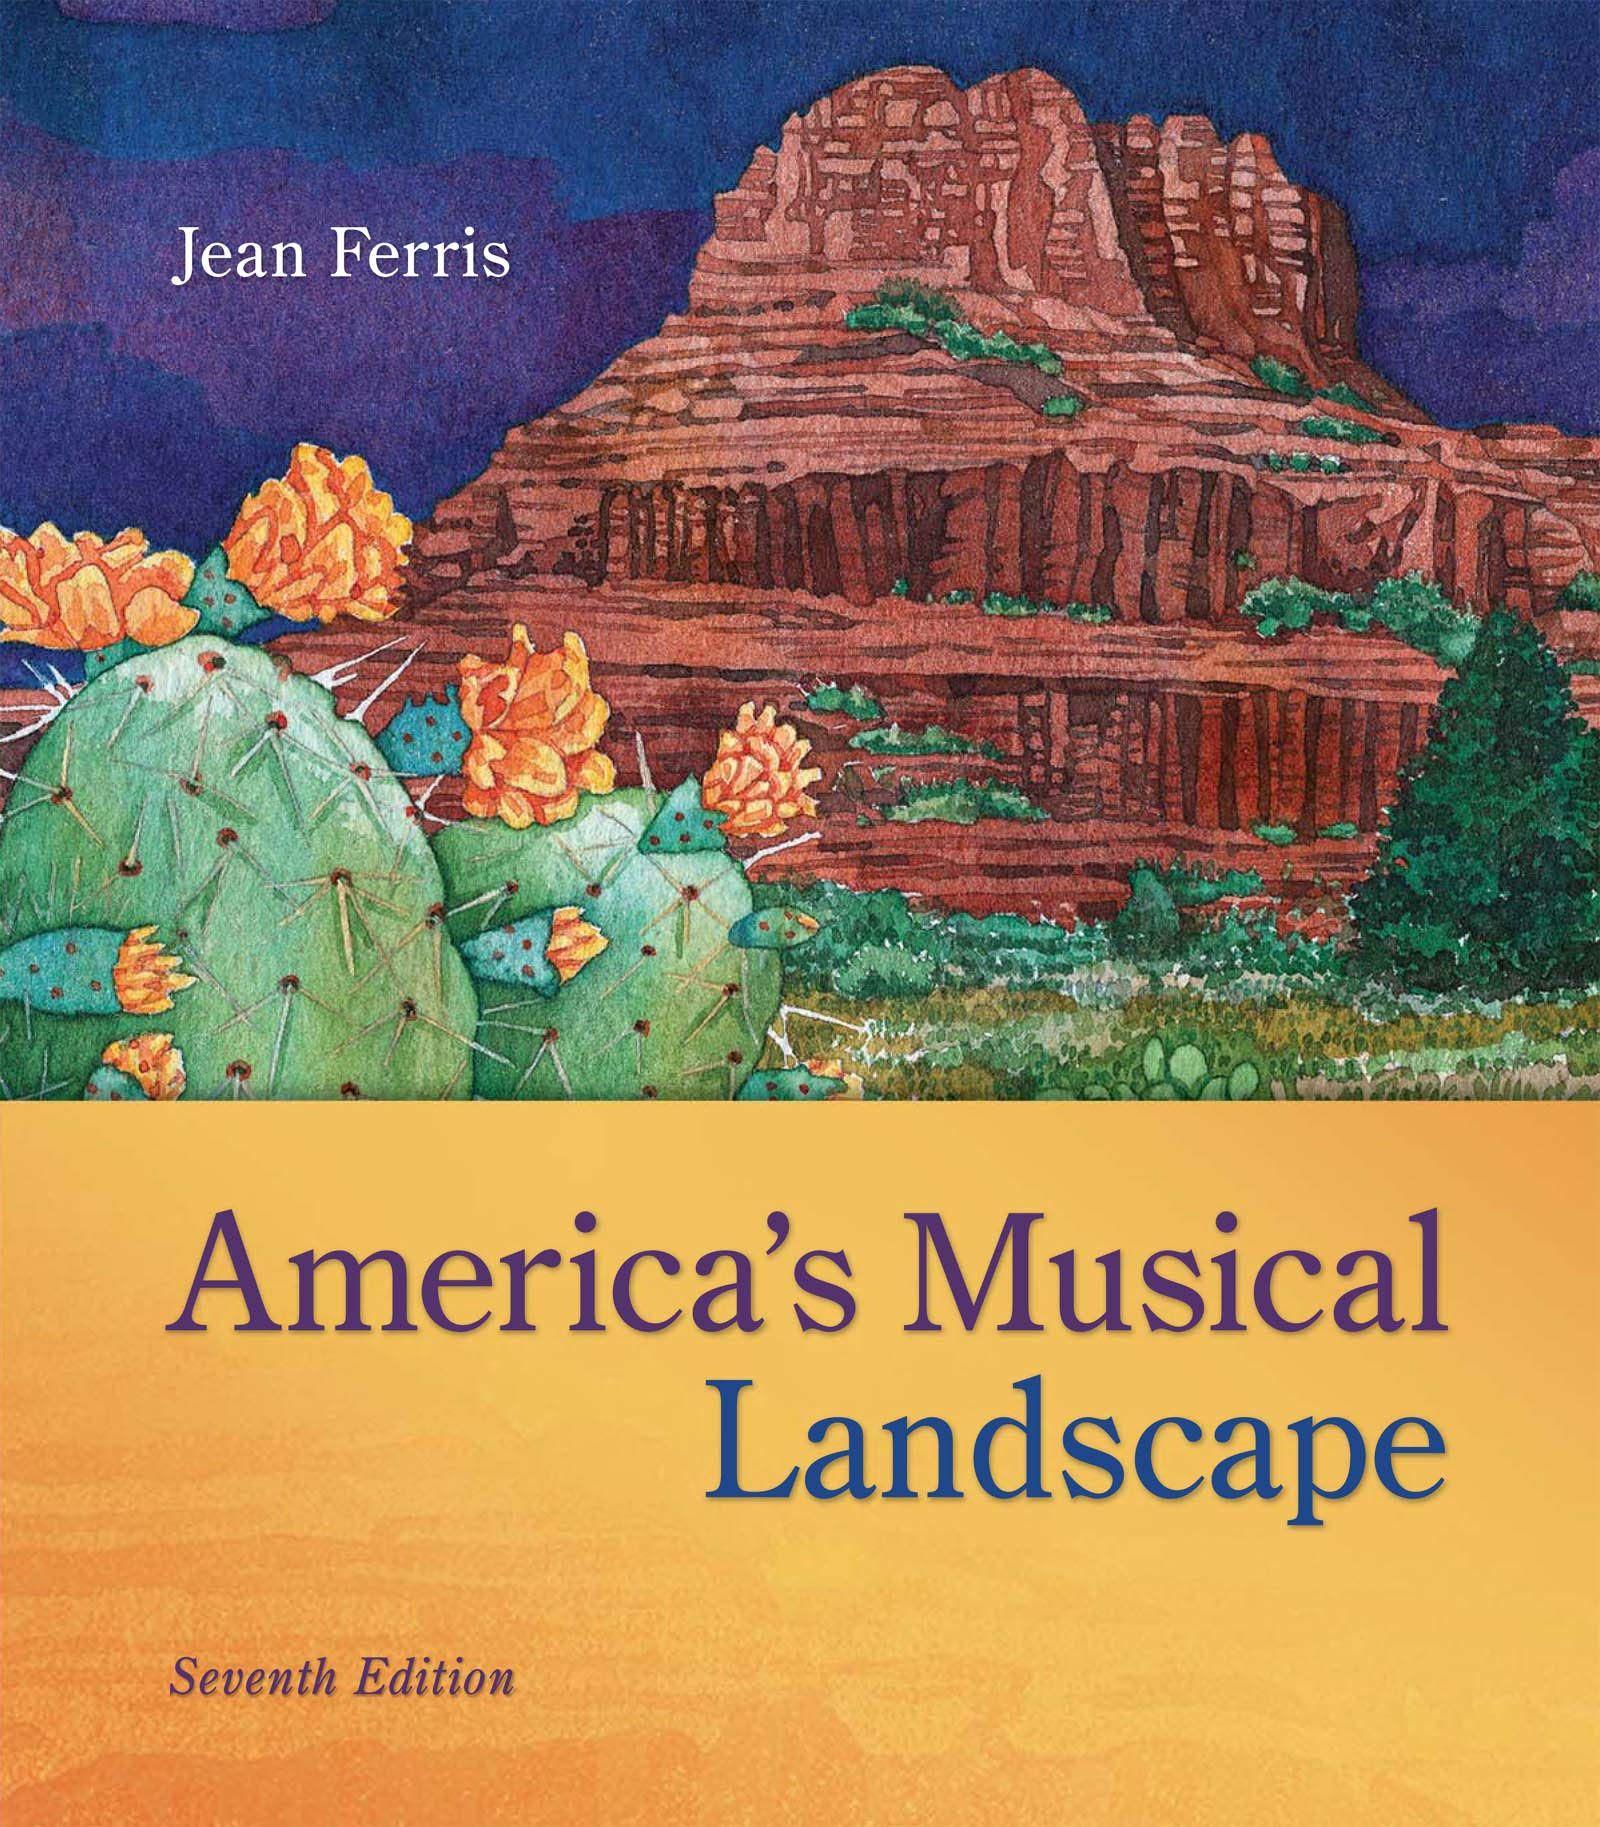 America S Musical Landscape 7th 7e By Jean Ferris Art Through The Ages Landscape Musicals